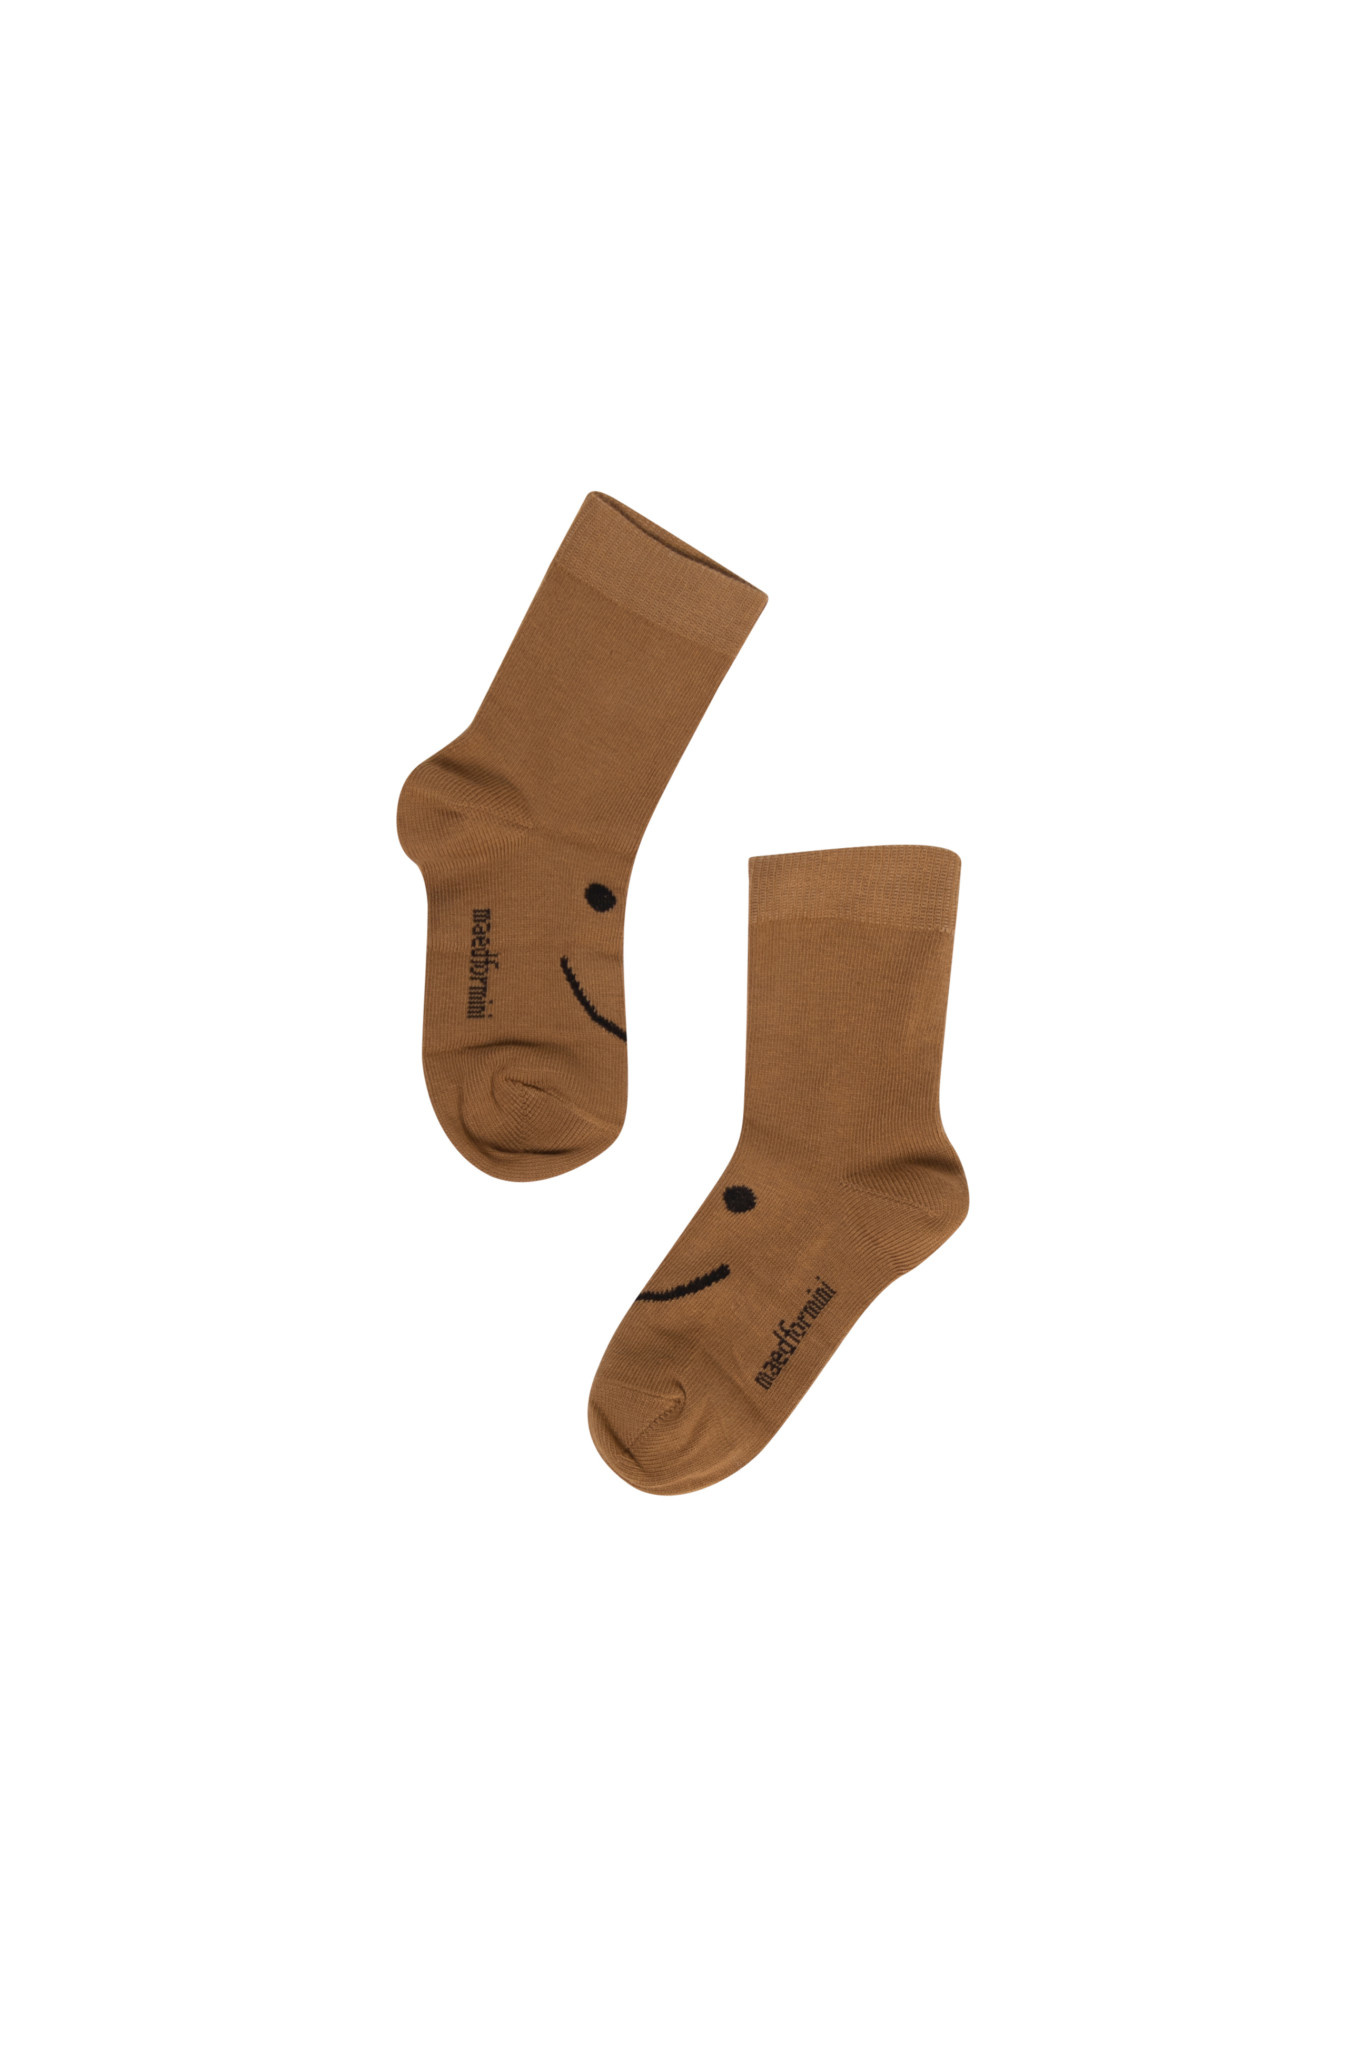 Socks sunny shoebill-1